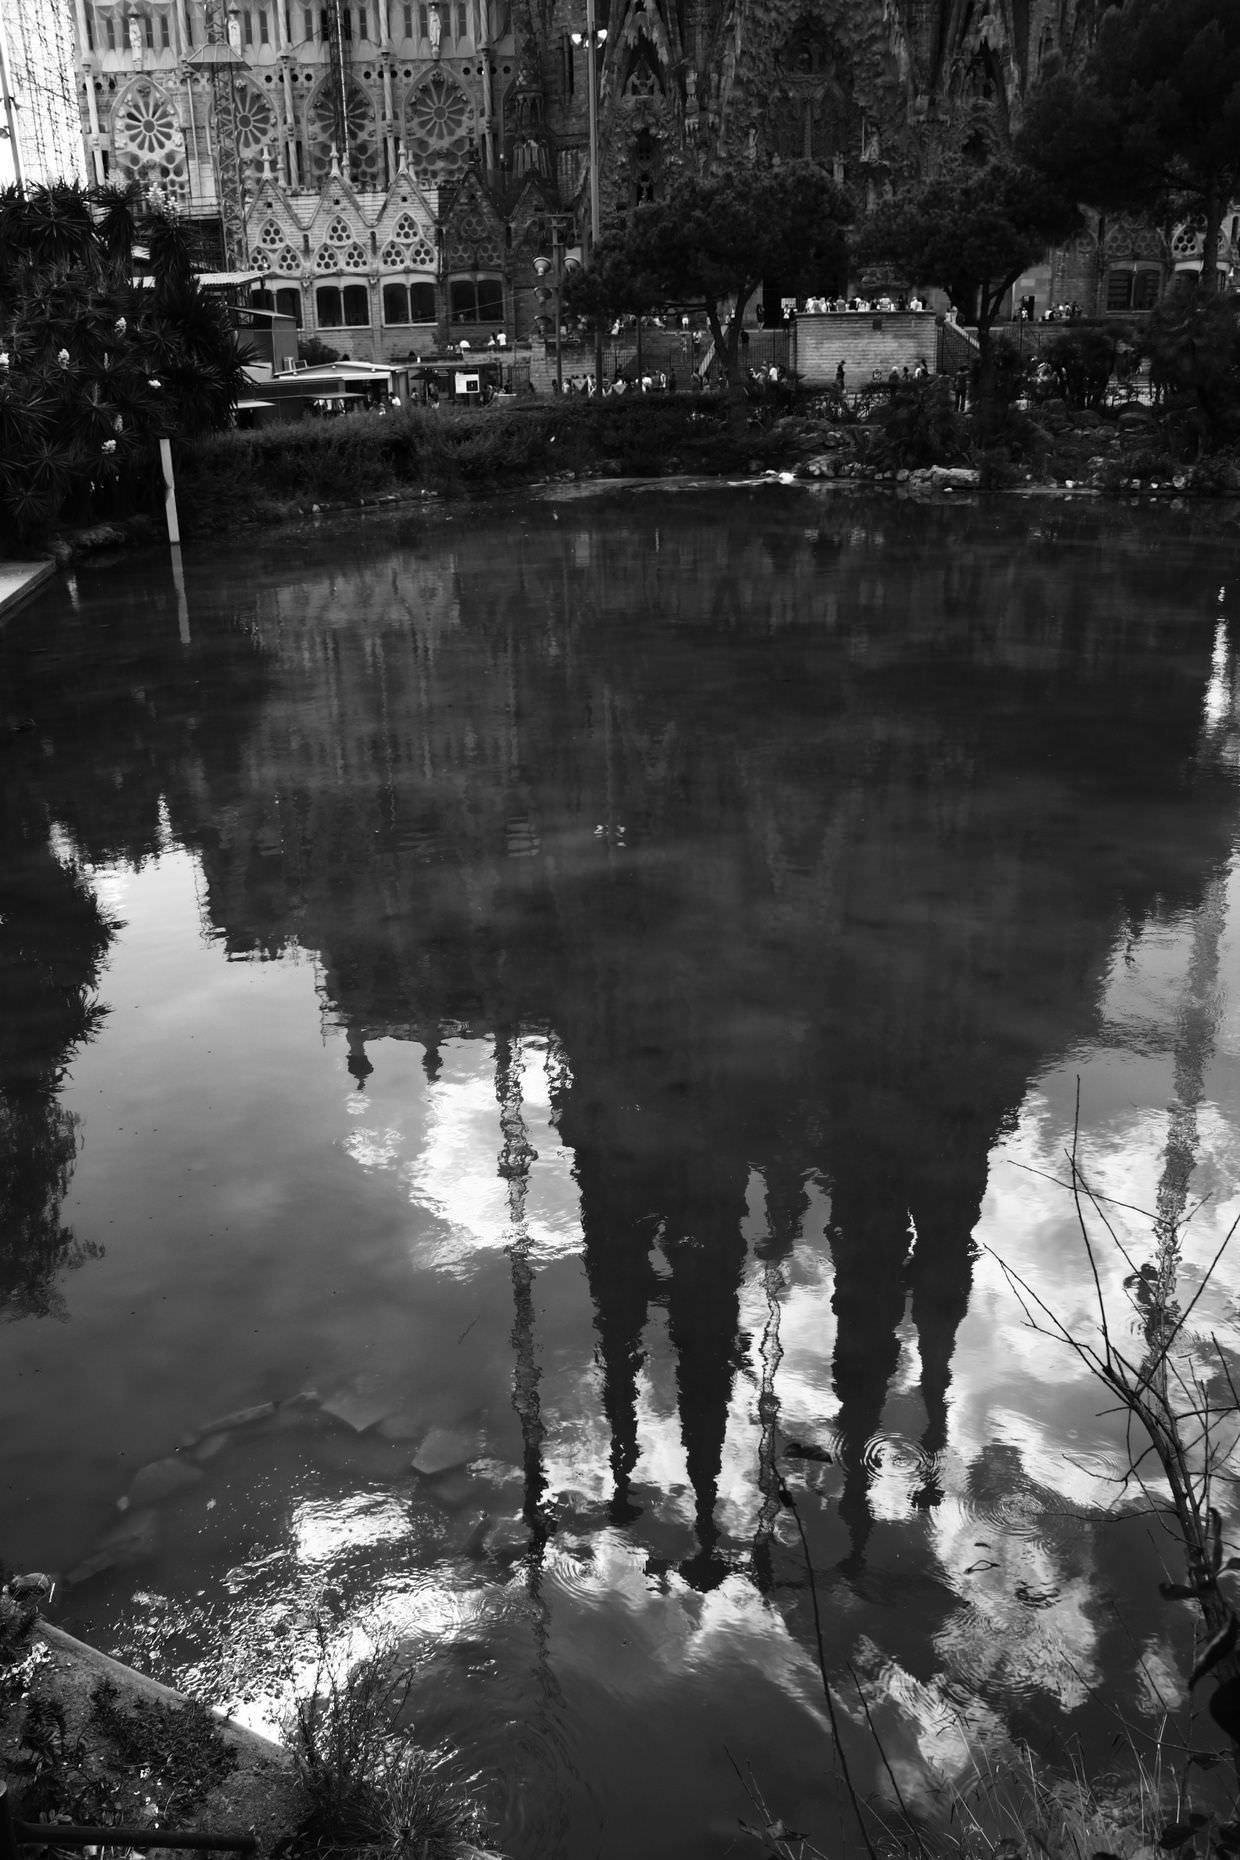 Reflections of La Sagrada Família